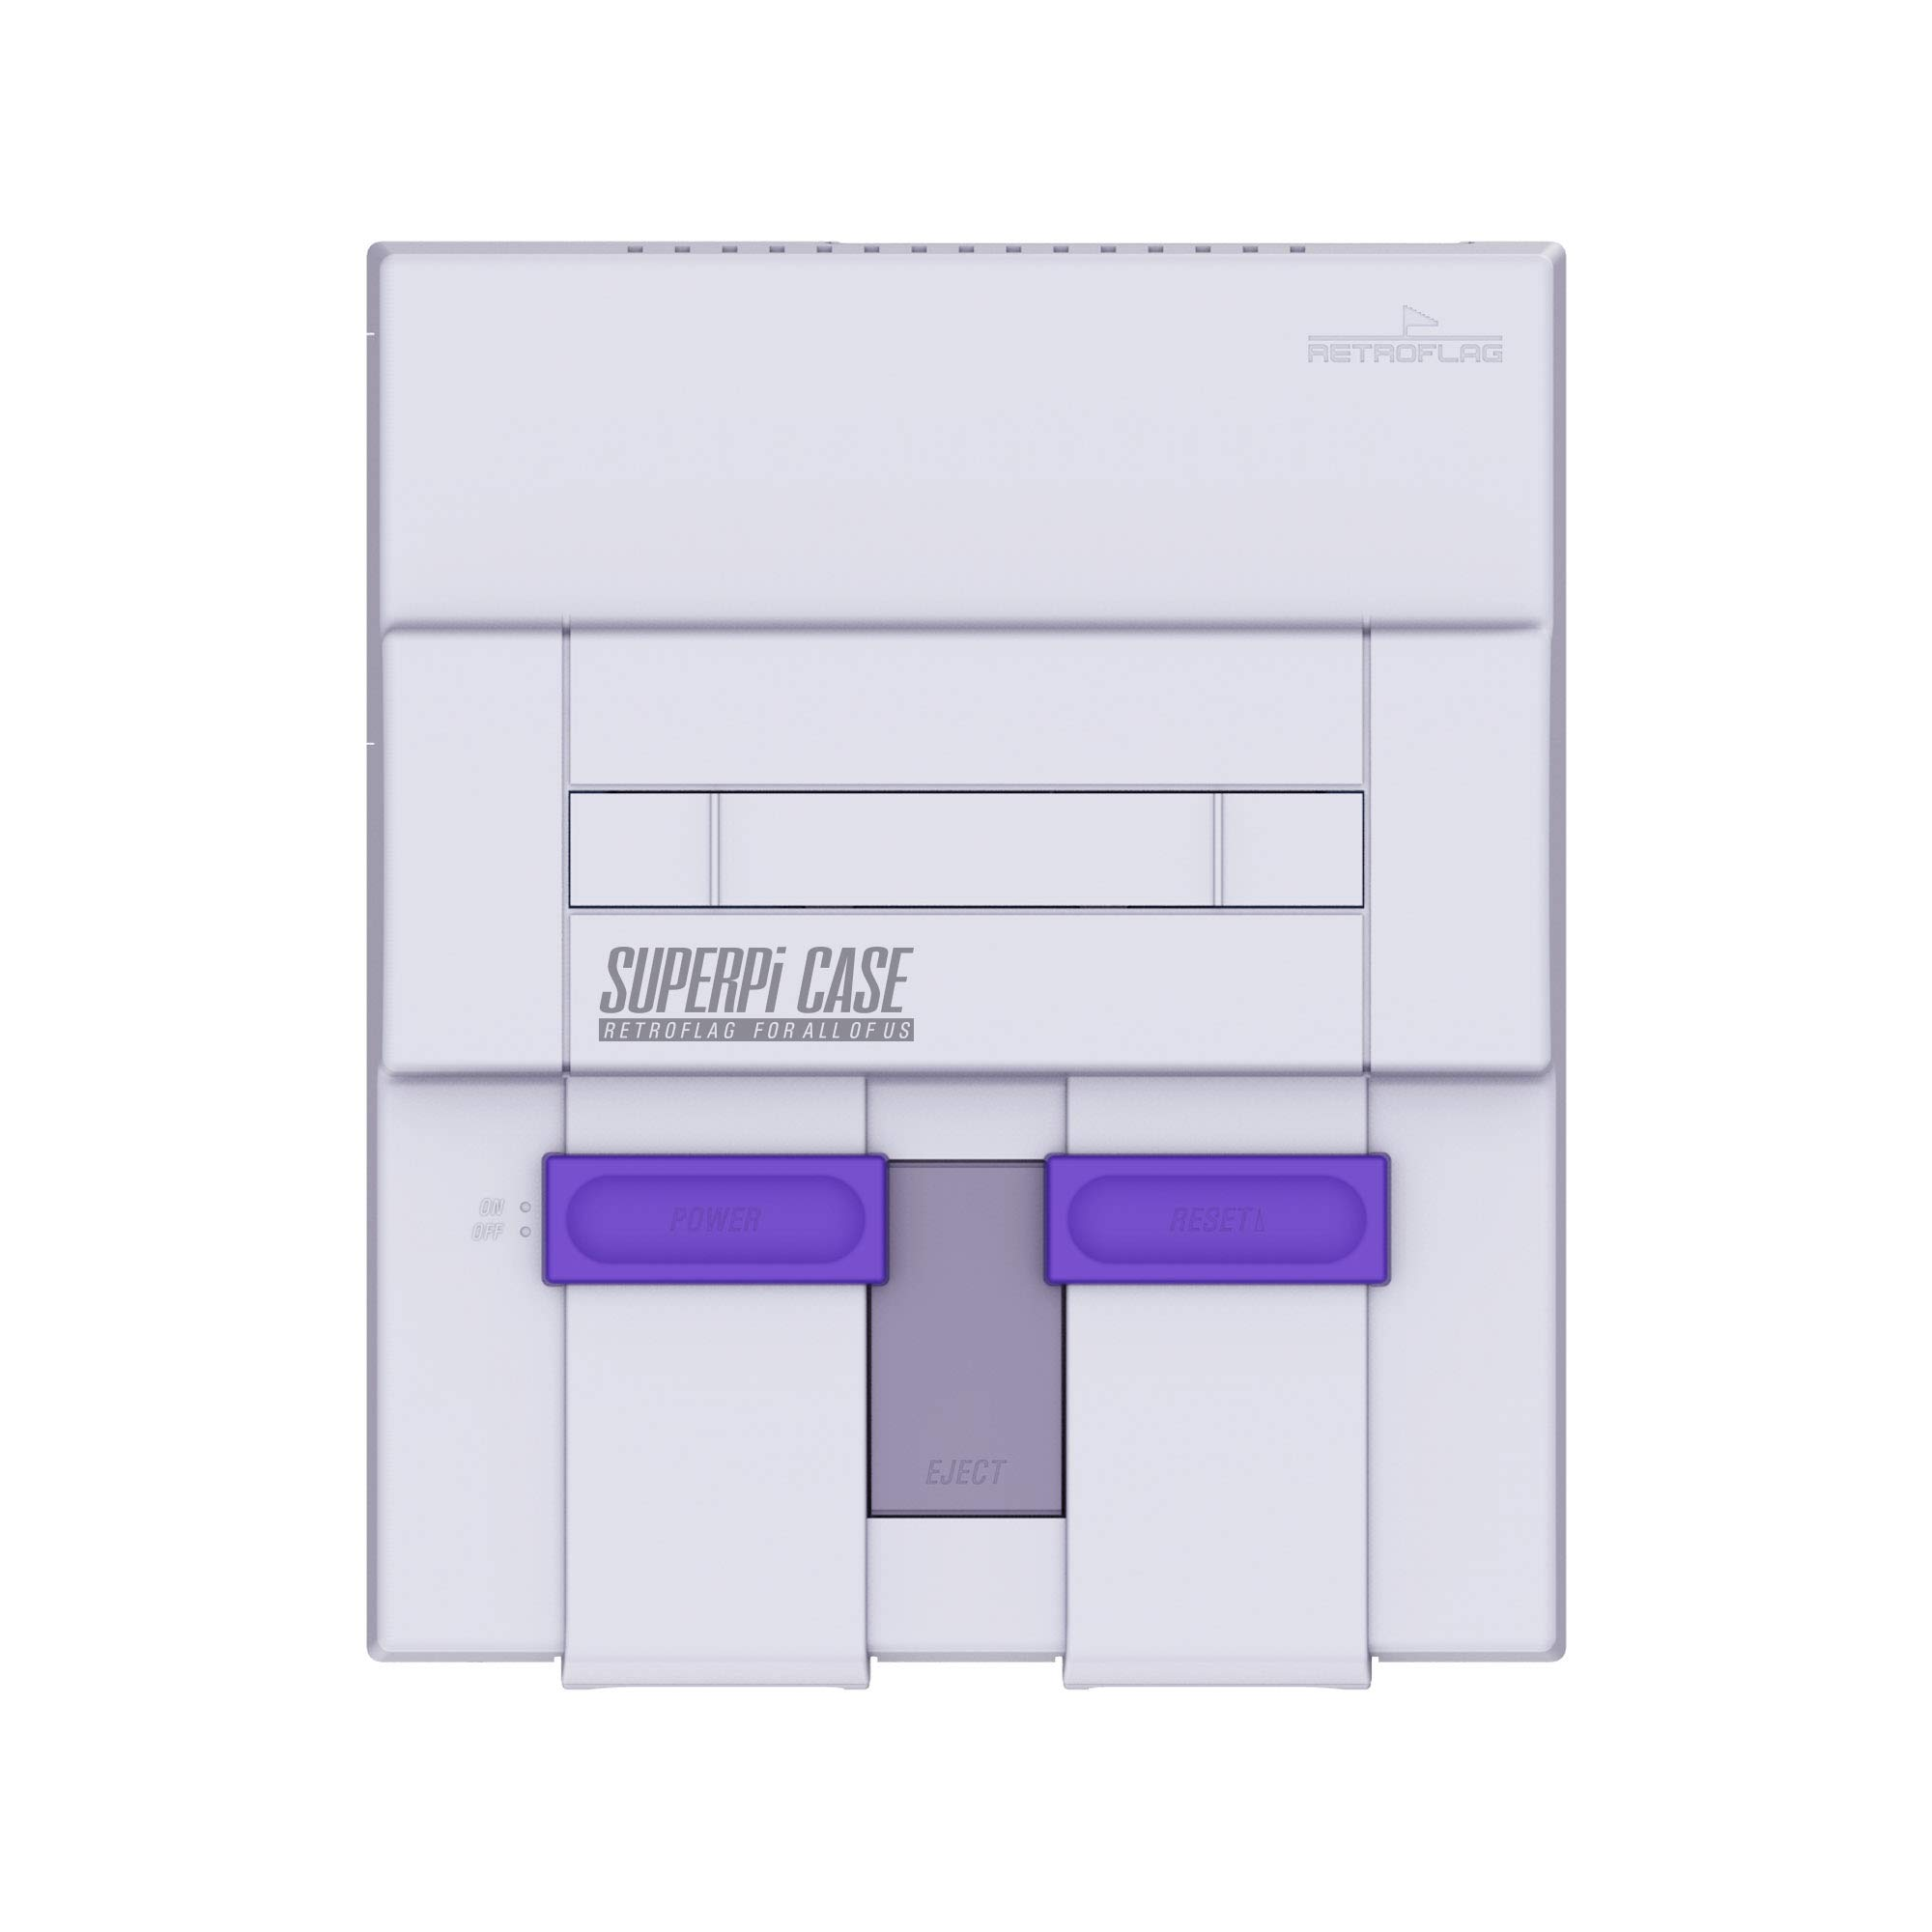 Retroflag SUPERPi Case Functional Power Button with Safe Shutdown for Raspberry Pi 3 B+ (B Plus) UCase